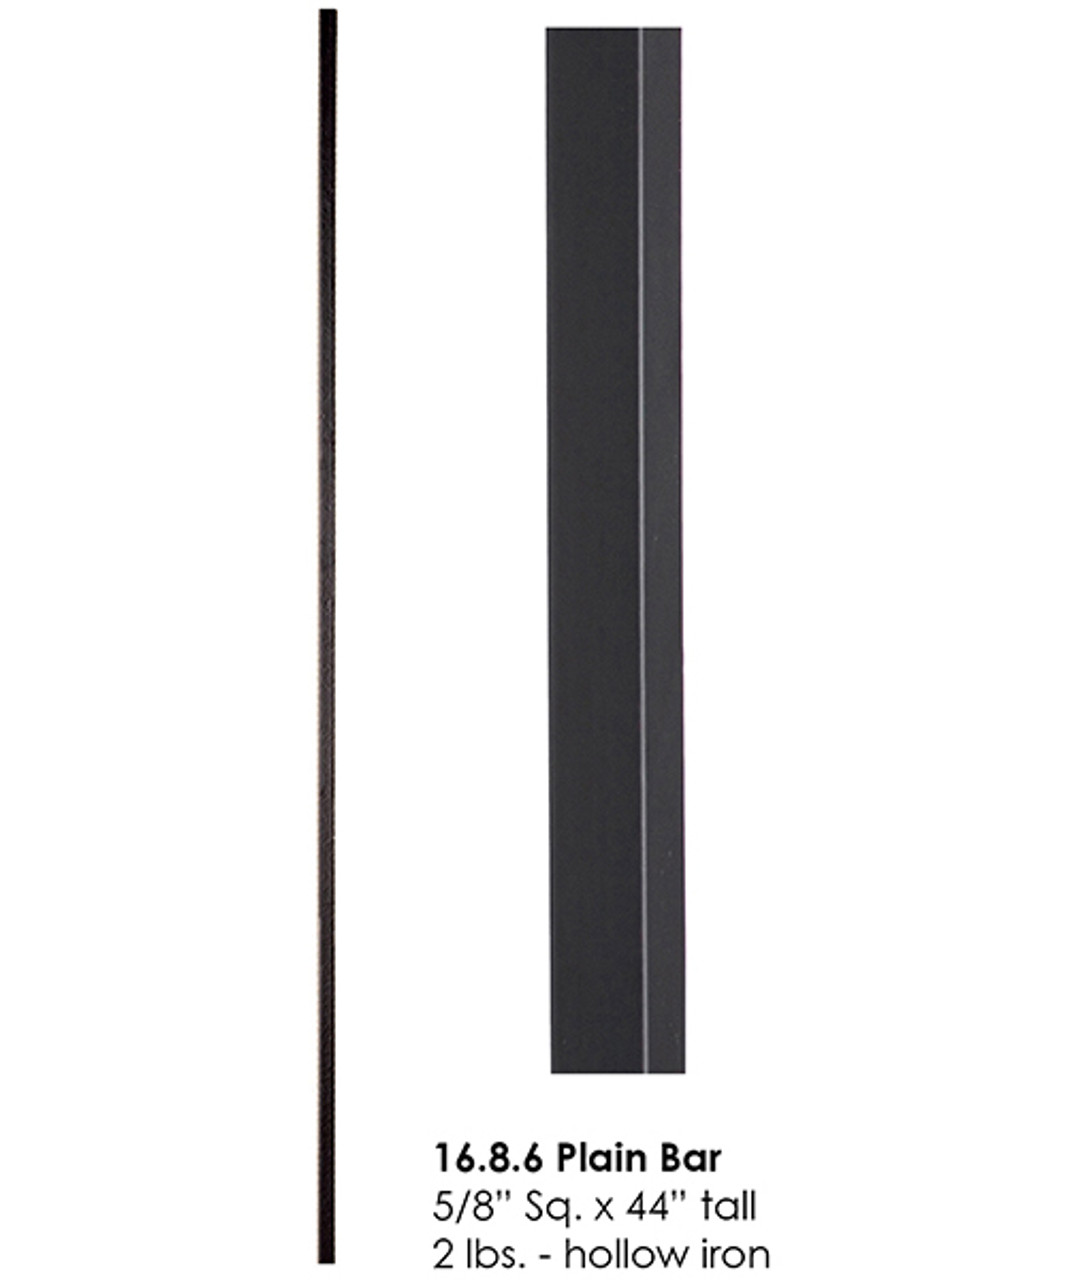 "HF16.8.6 5/8"" Square Tubular Steel"